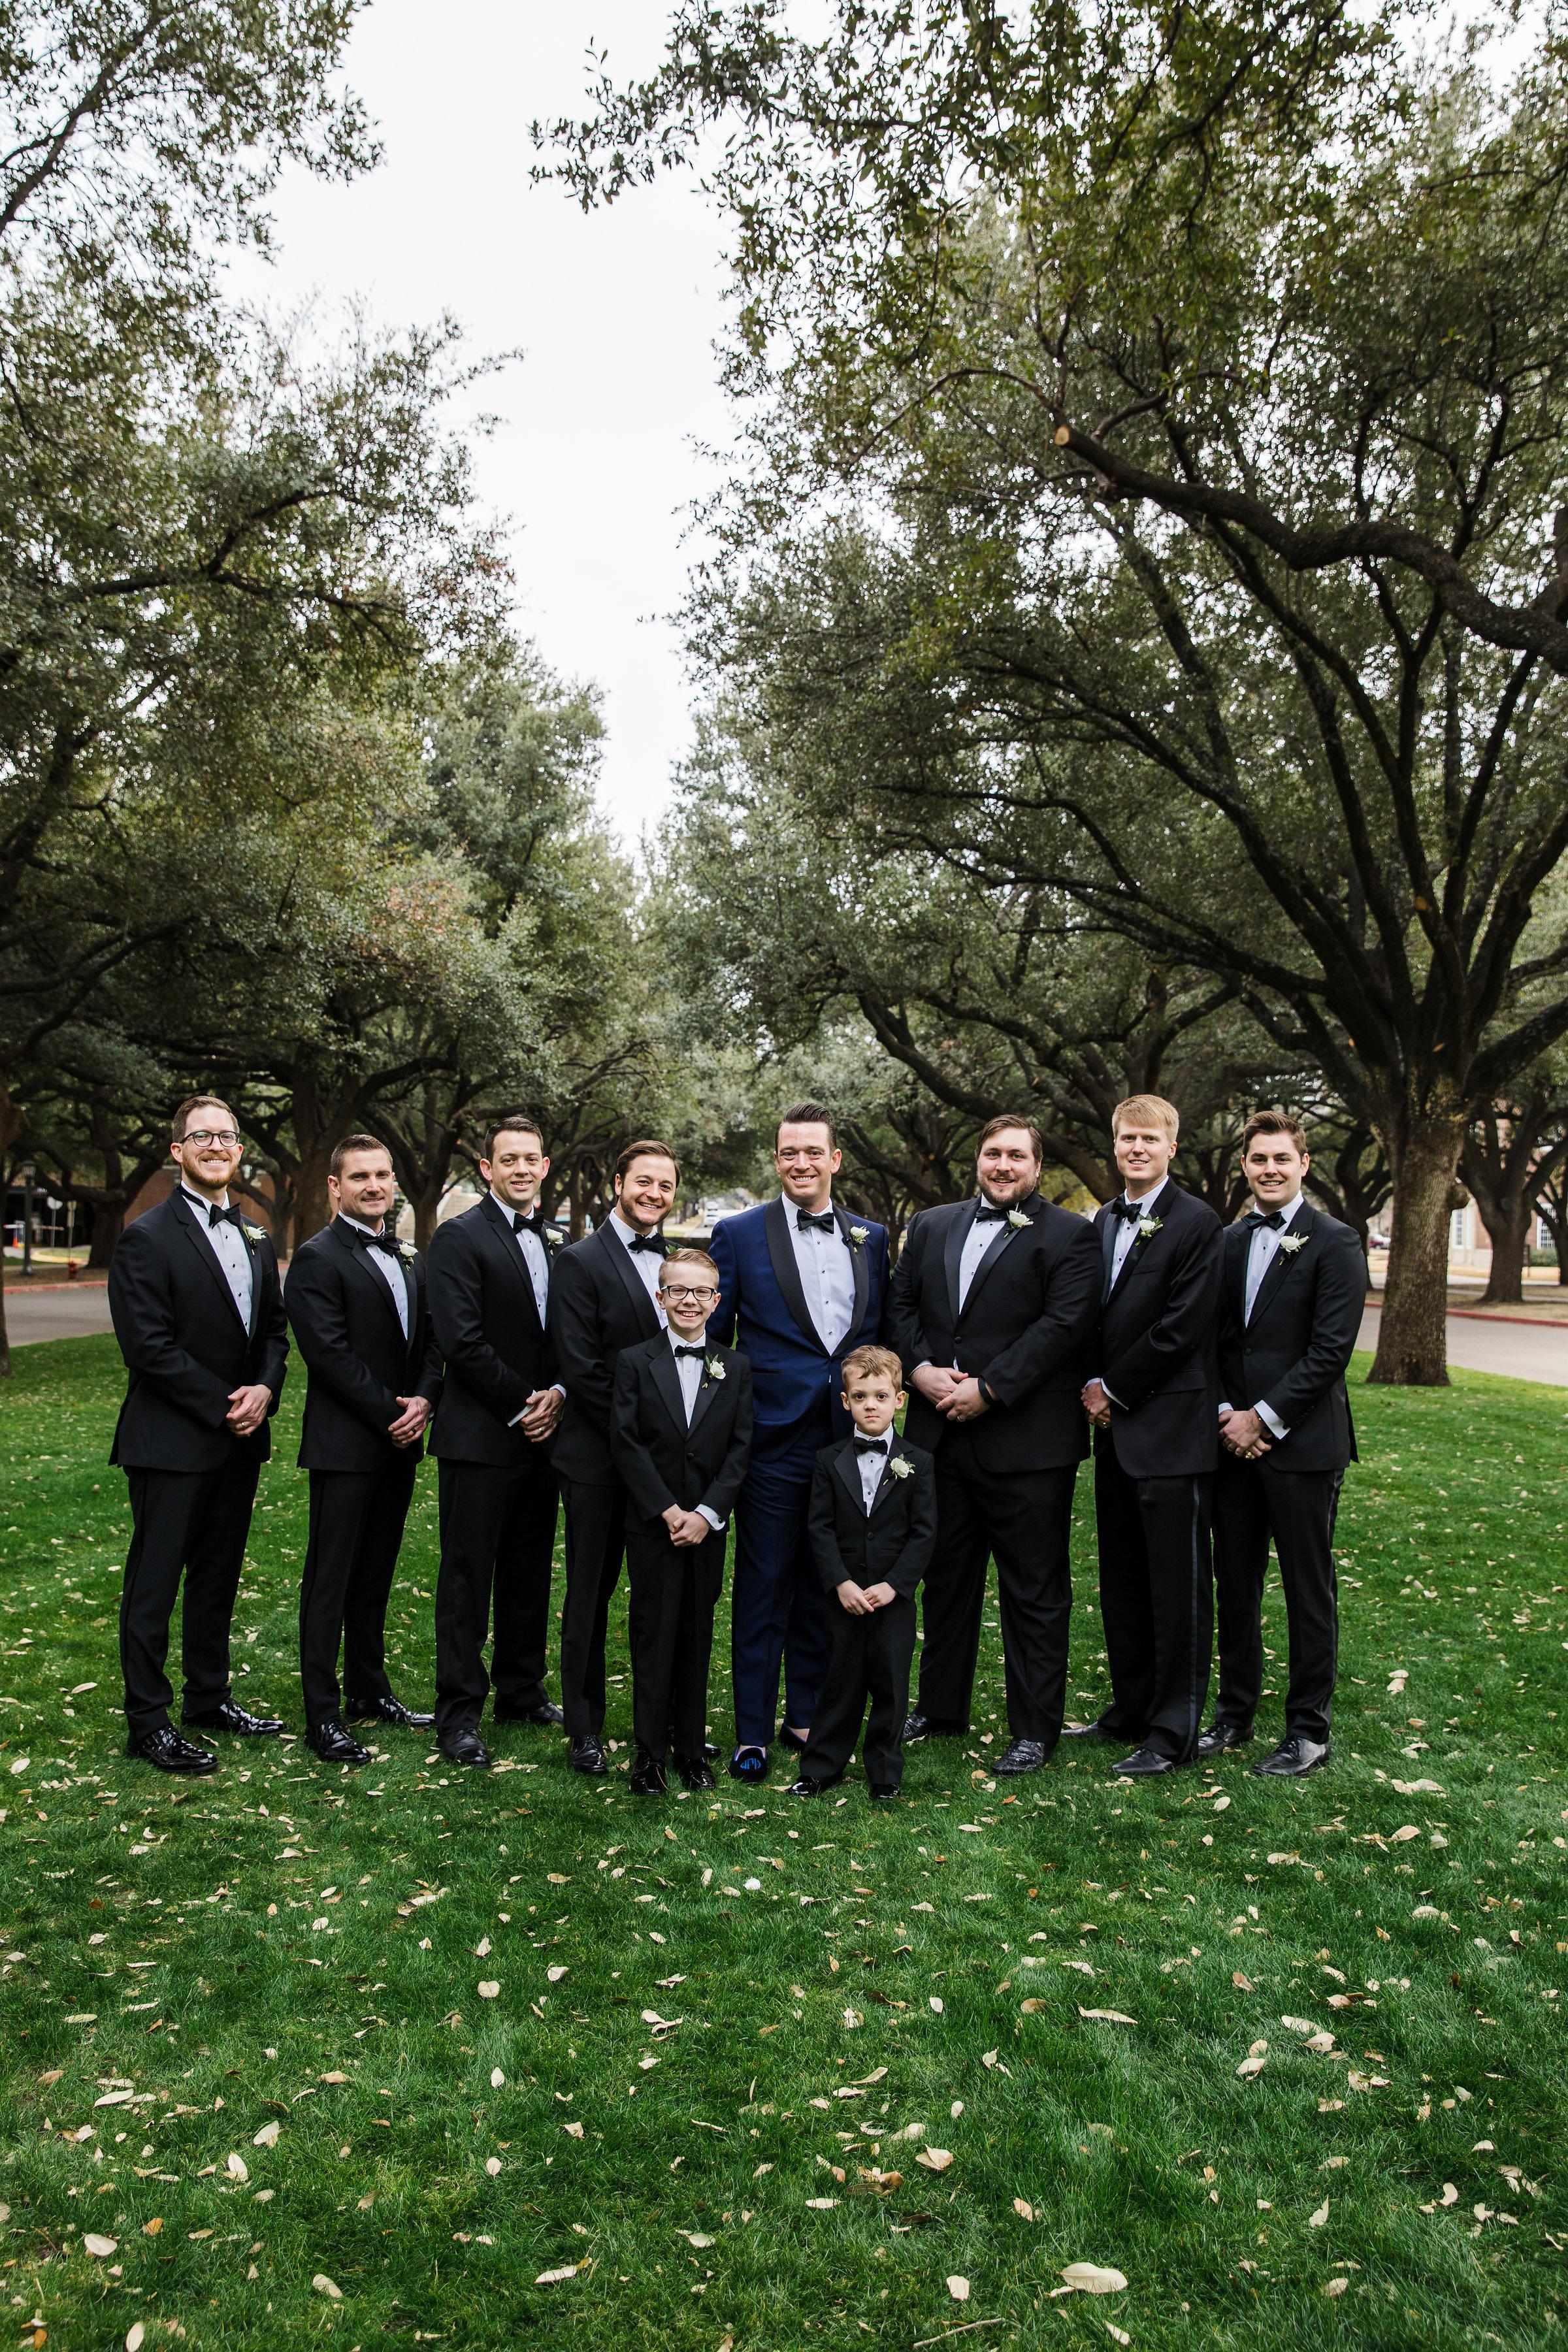 Groomsman Details - Dallas, Texas - Winter Wedding - Julian Leaver Events